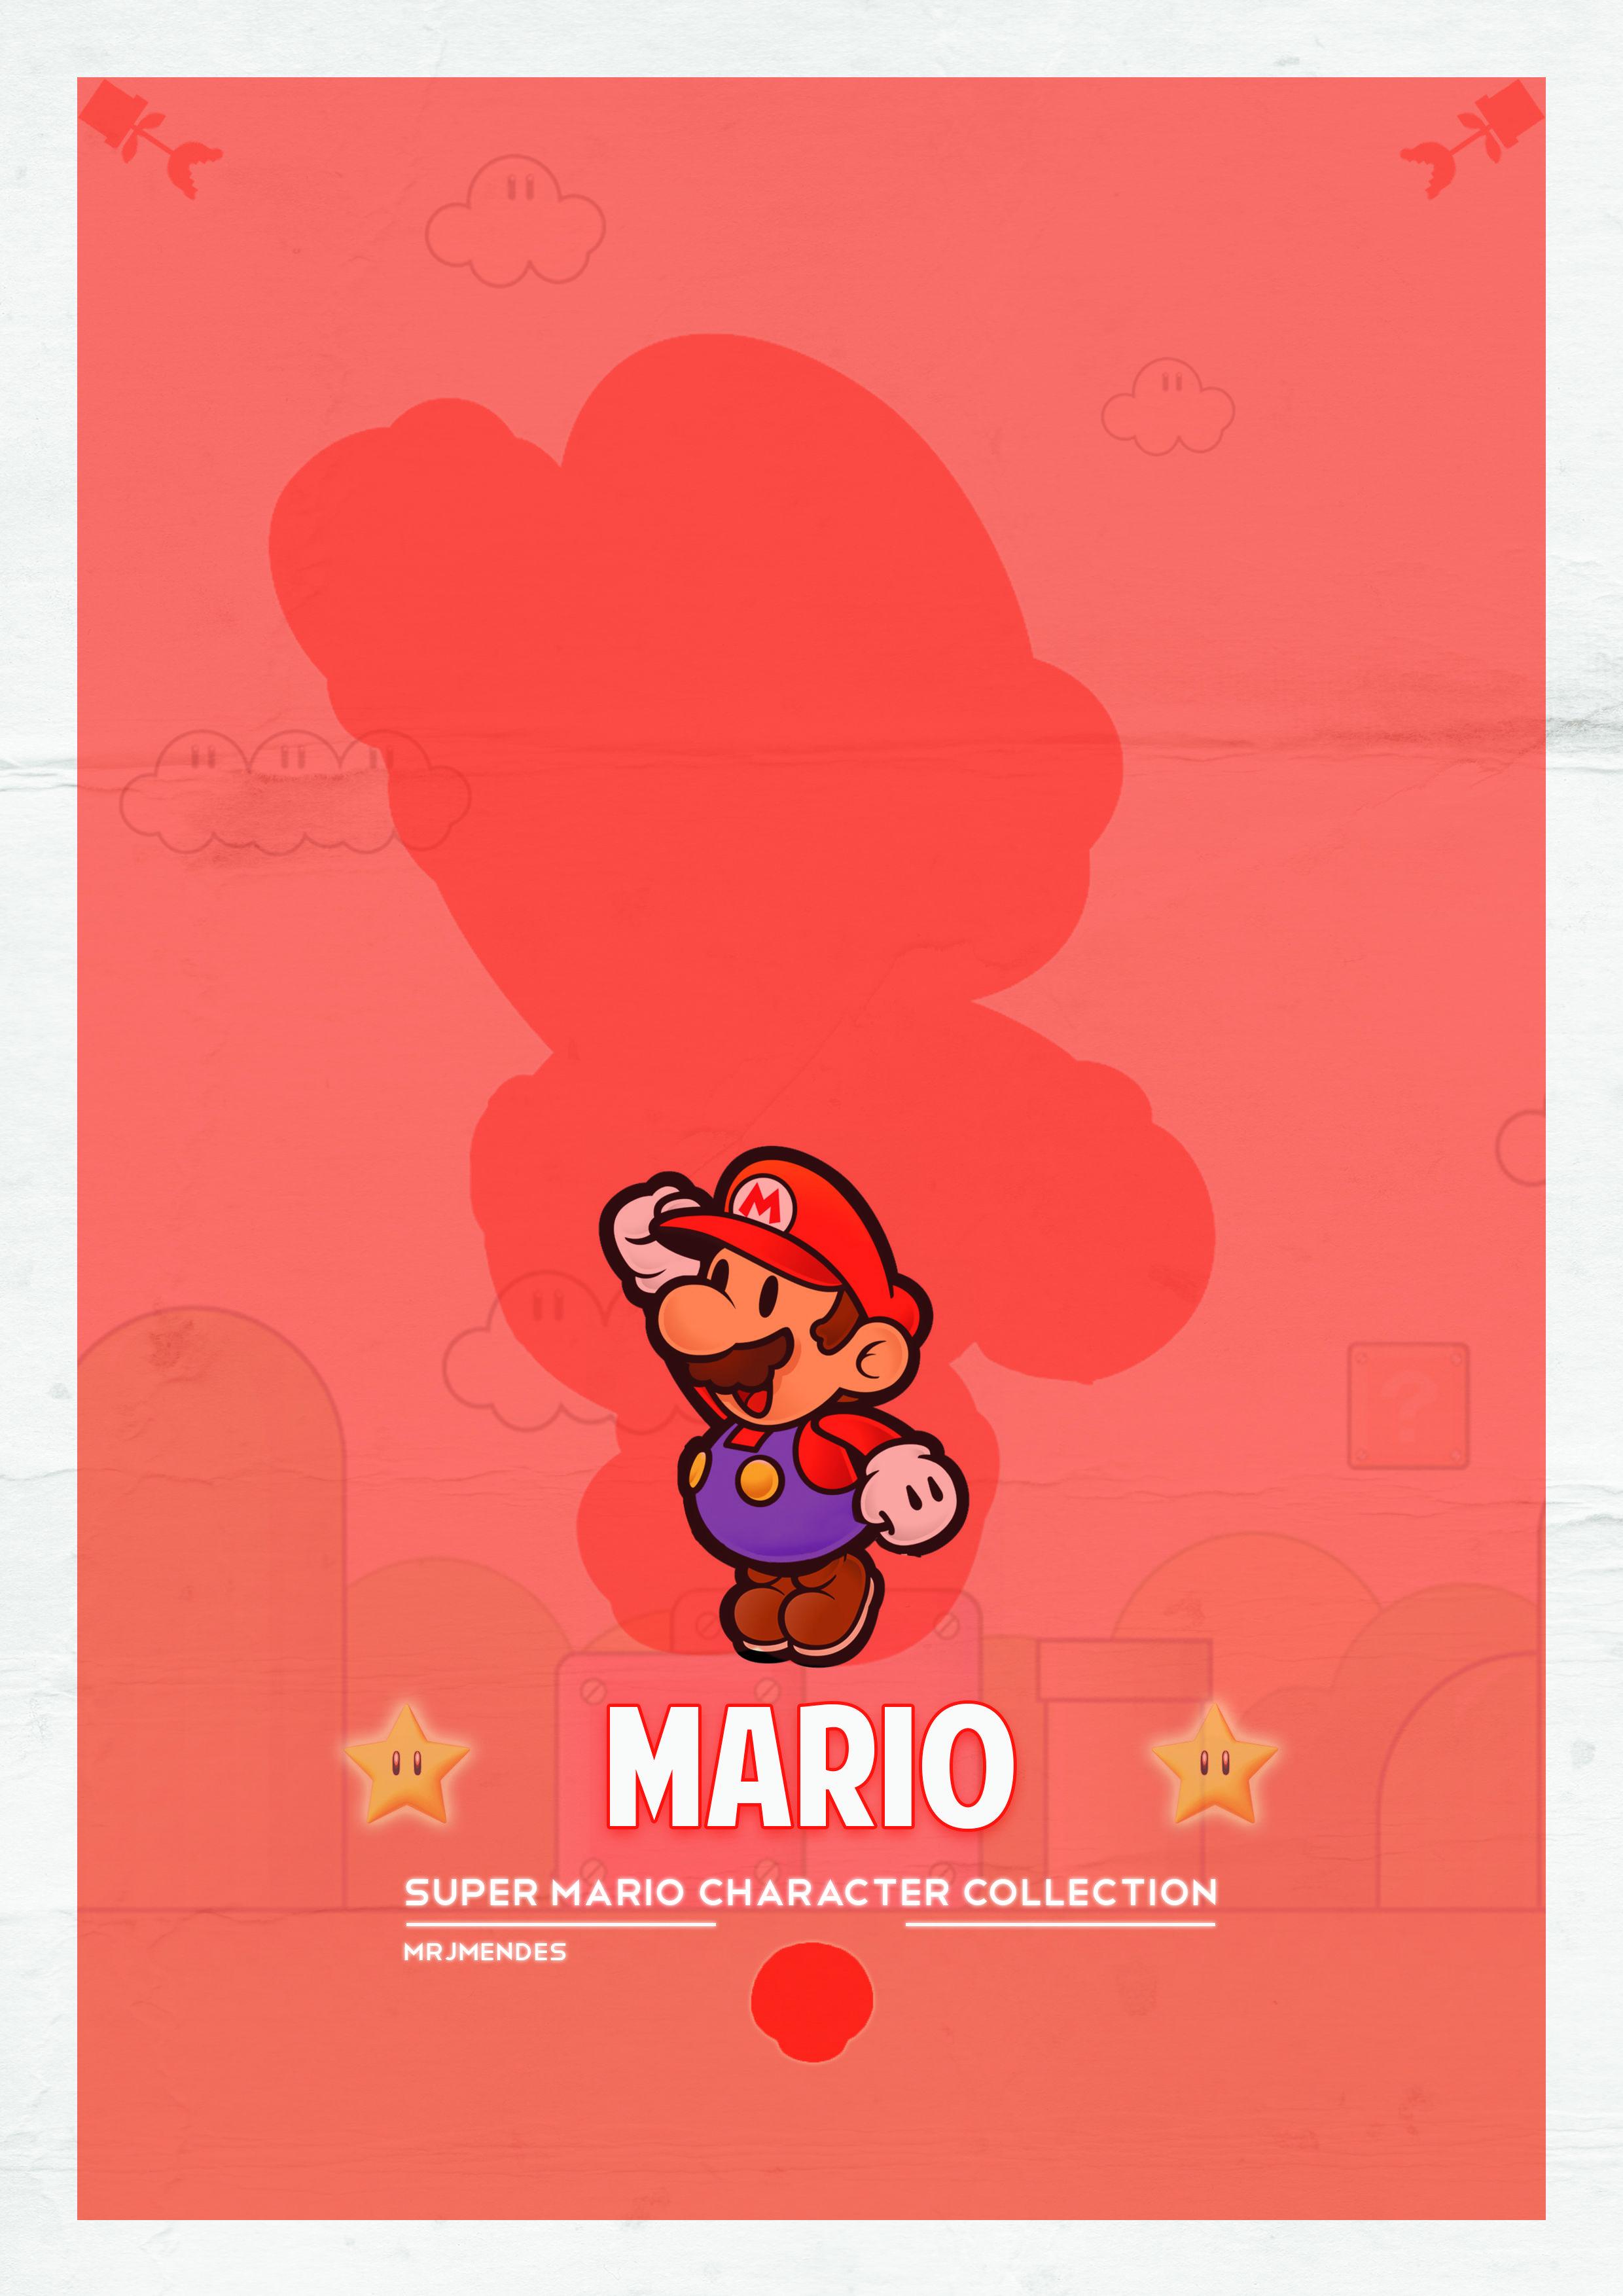 Mario In Cmyk Mode Looks Better Super Mario Bros Collection Poster Vintage Geed Nerd Arcade Game Retro Mario Luigi Peach Retro Arcade Luigi